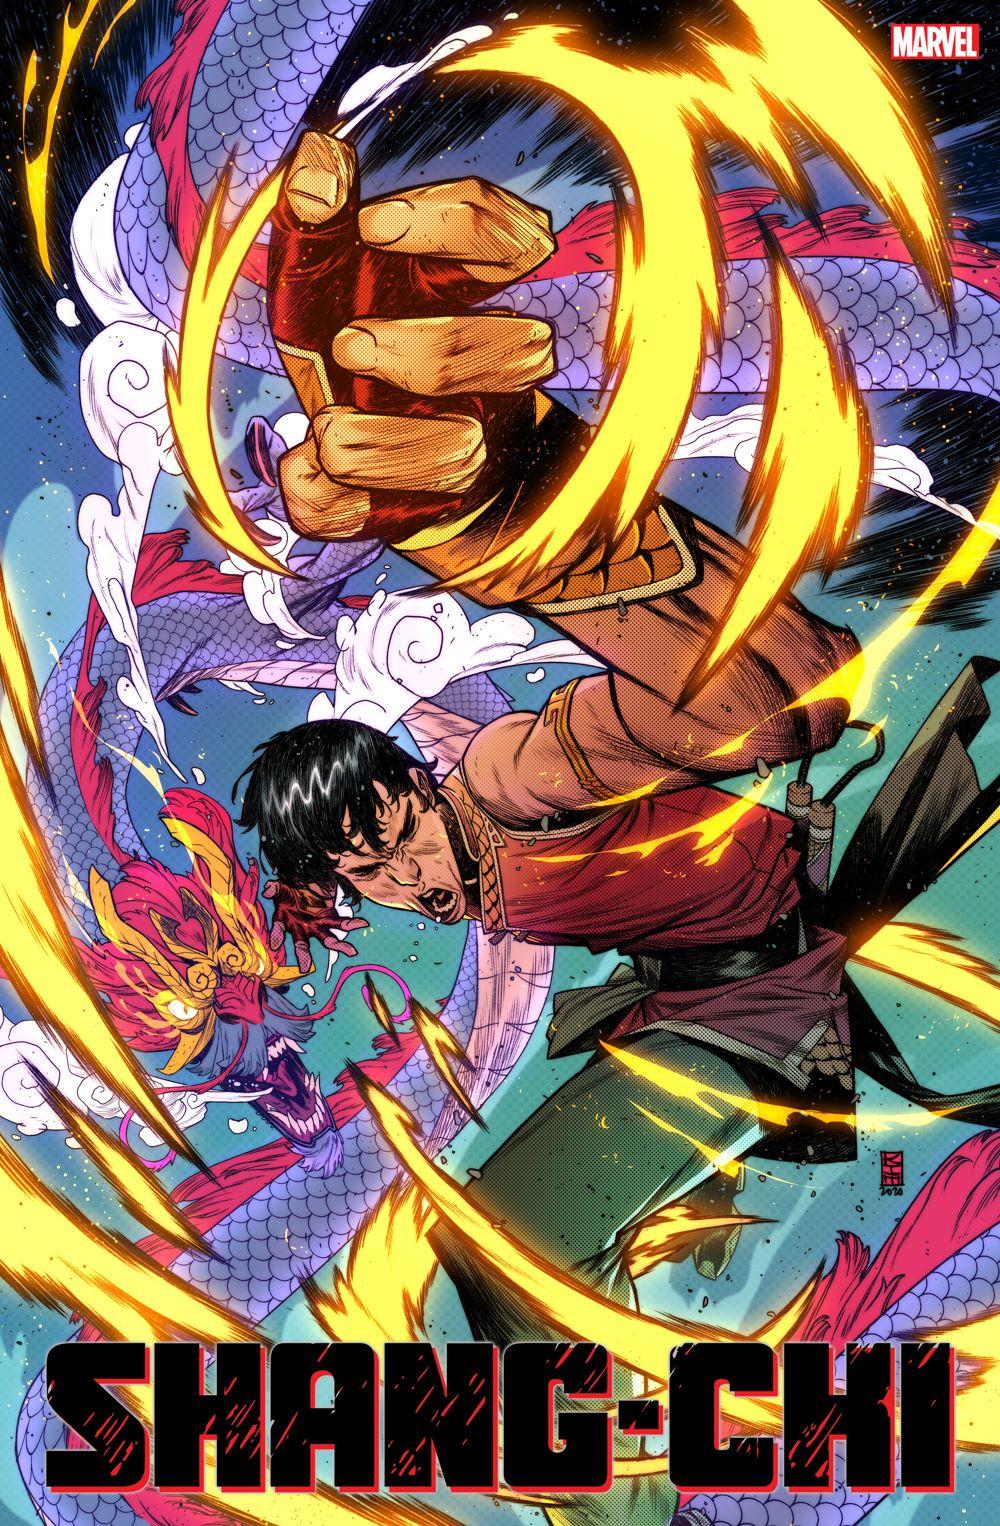 SHANGCHI2020001_Jacinto_var Marvel releases a shocking Kim Jacinto SHANG-CHI #1 variant cover